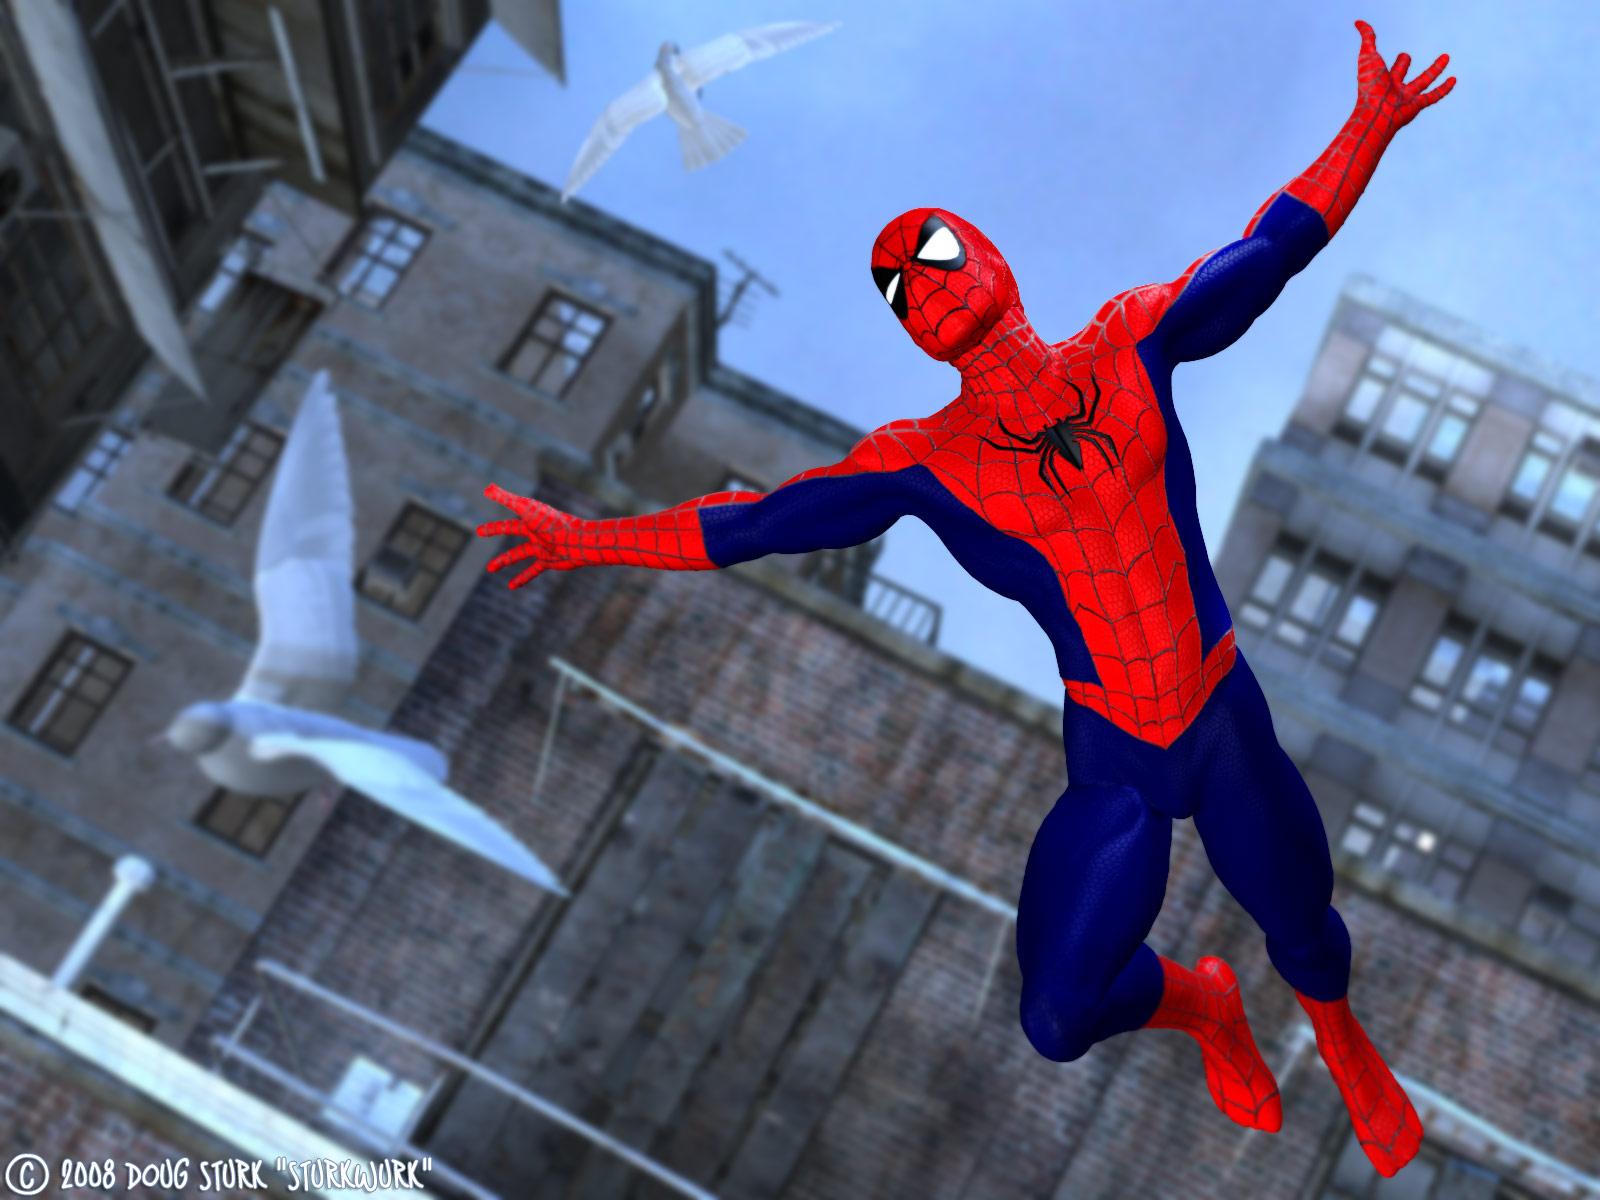 Spider-Man Jubilation 1 of 2